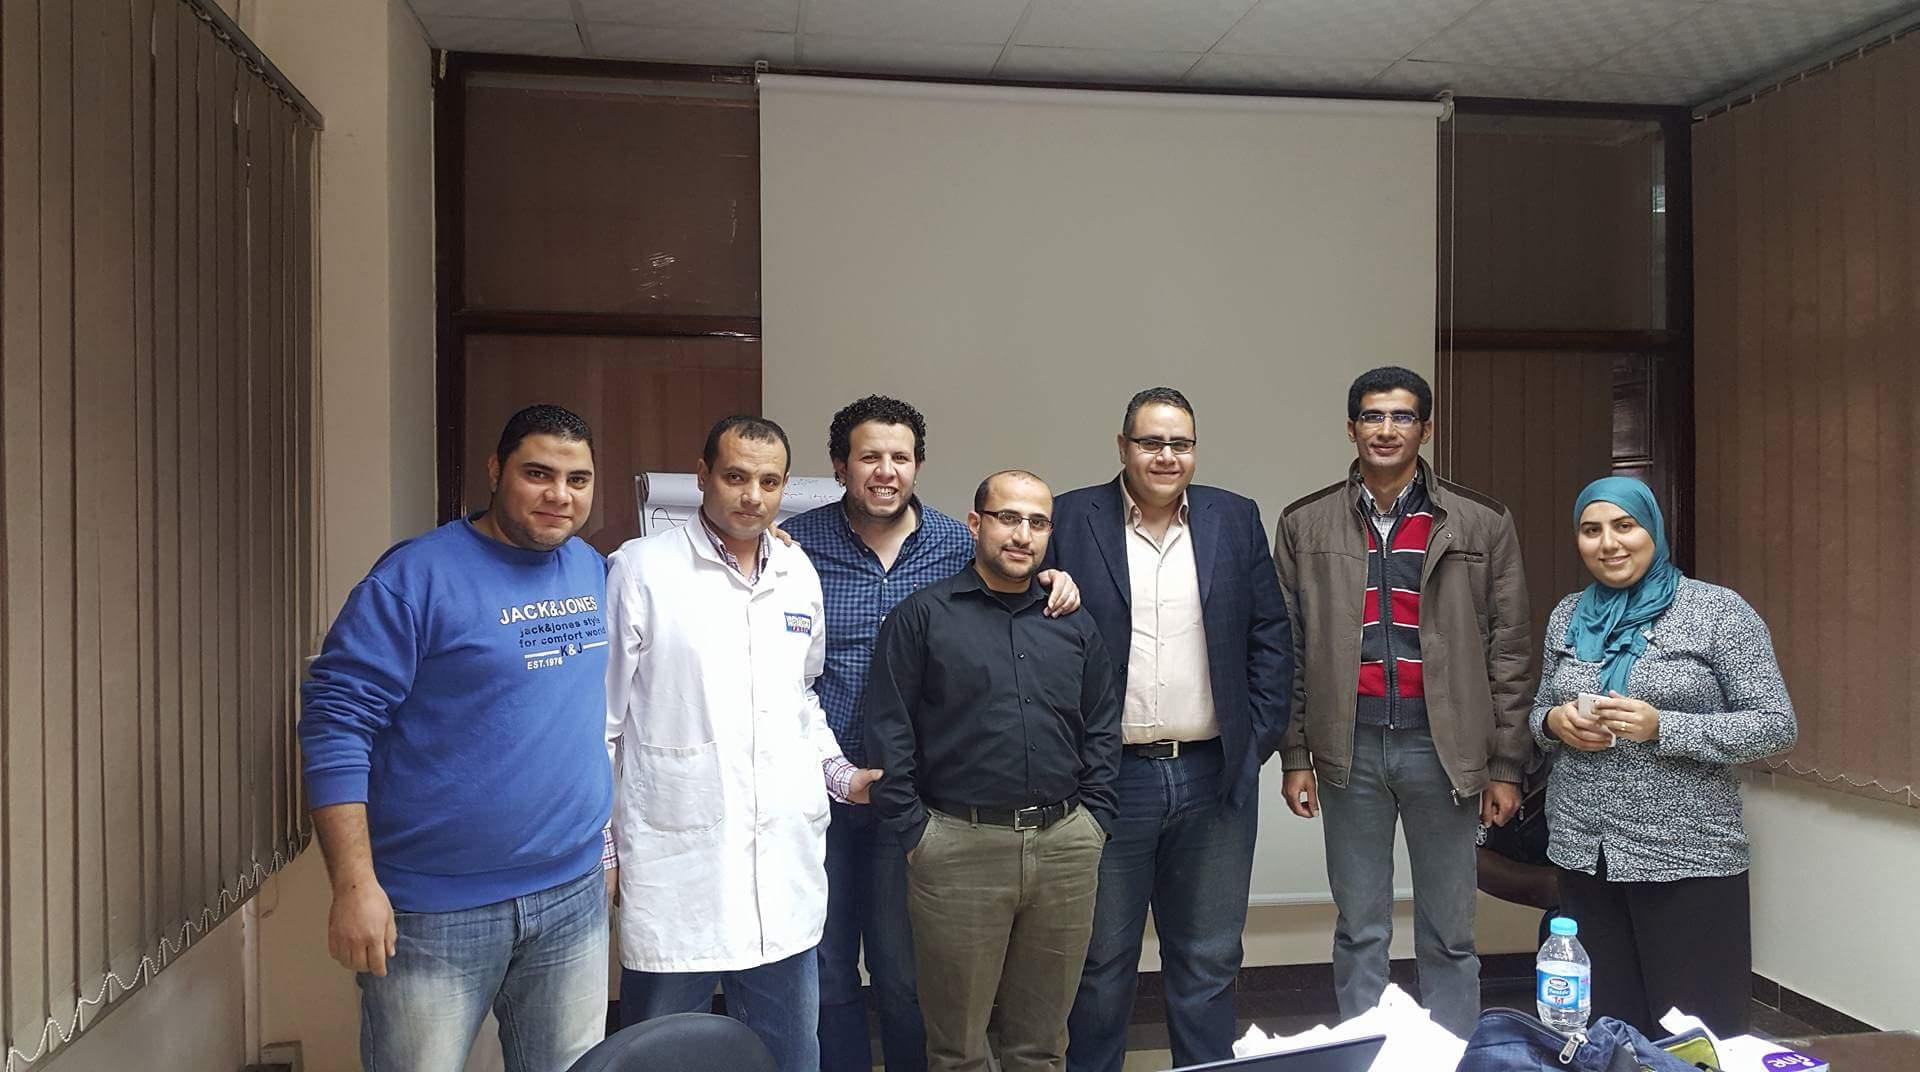 Excellence Center Egypt20160331-received_1079530502069691.jpeg .jpg